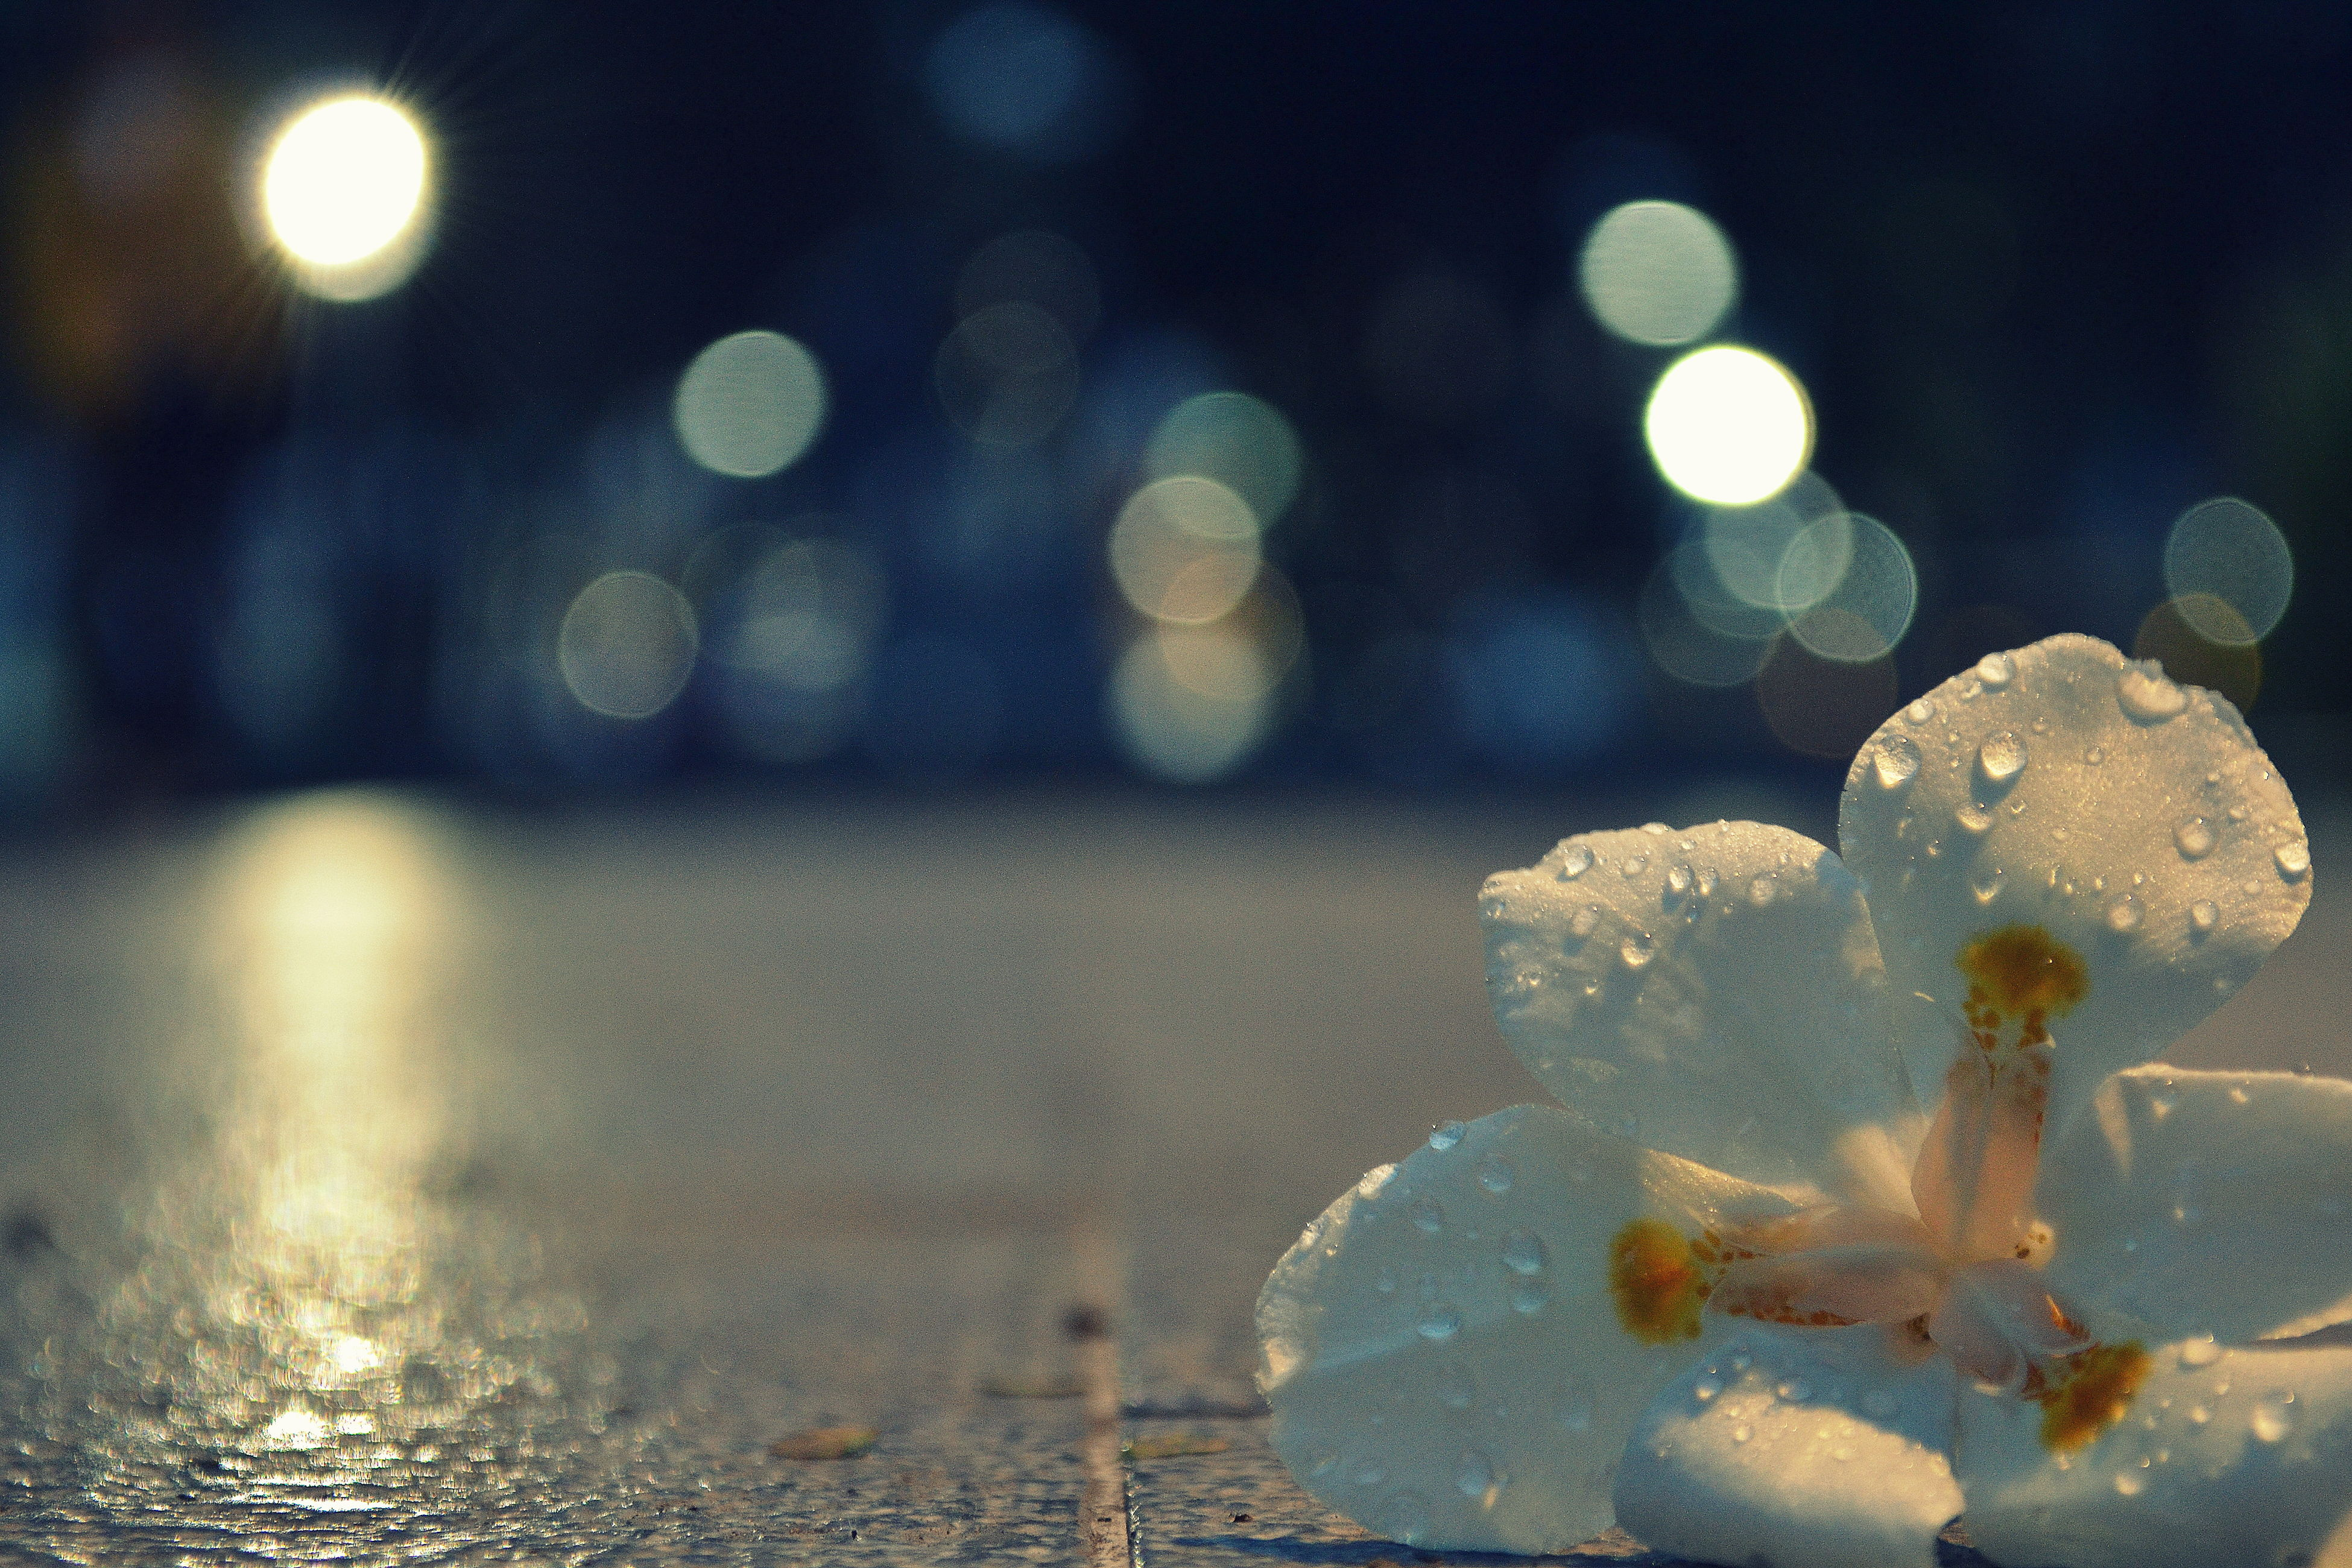 illuminated, night, water, wet, defocused, street, lighting equipment, rain, close-up, drop, reflection, glowing, light - natural phenomenon, circle, no people, weather, outdoors, lens flare, pattern